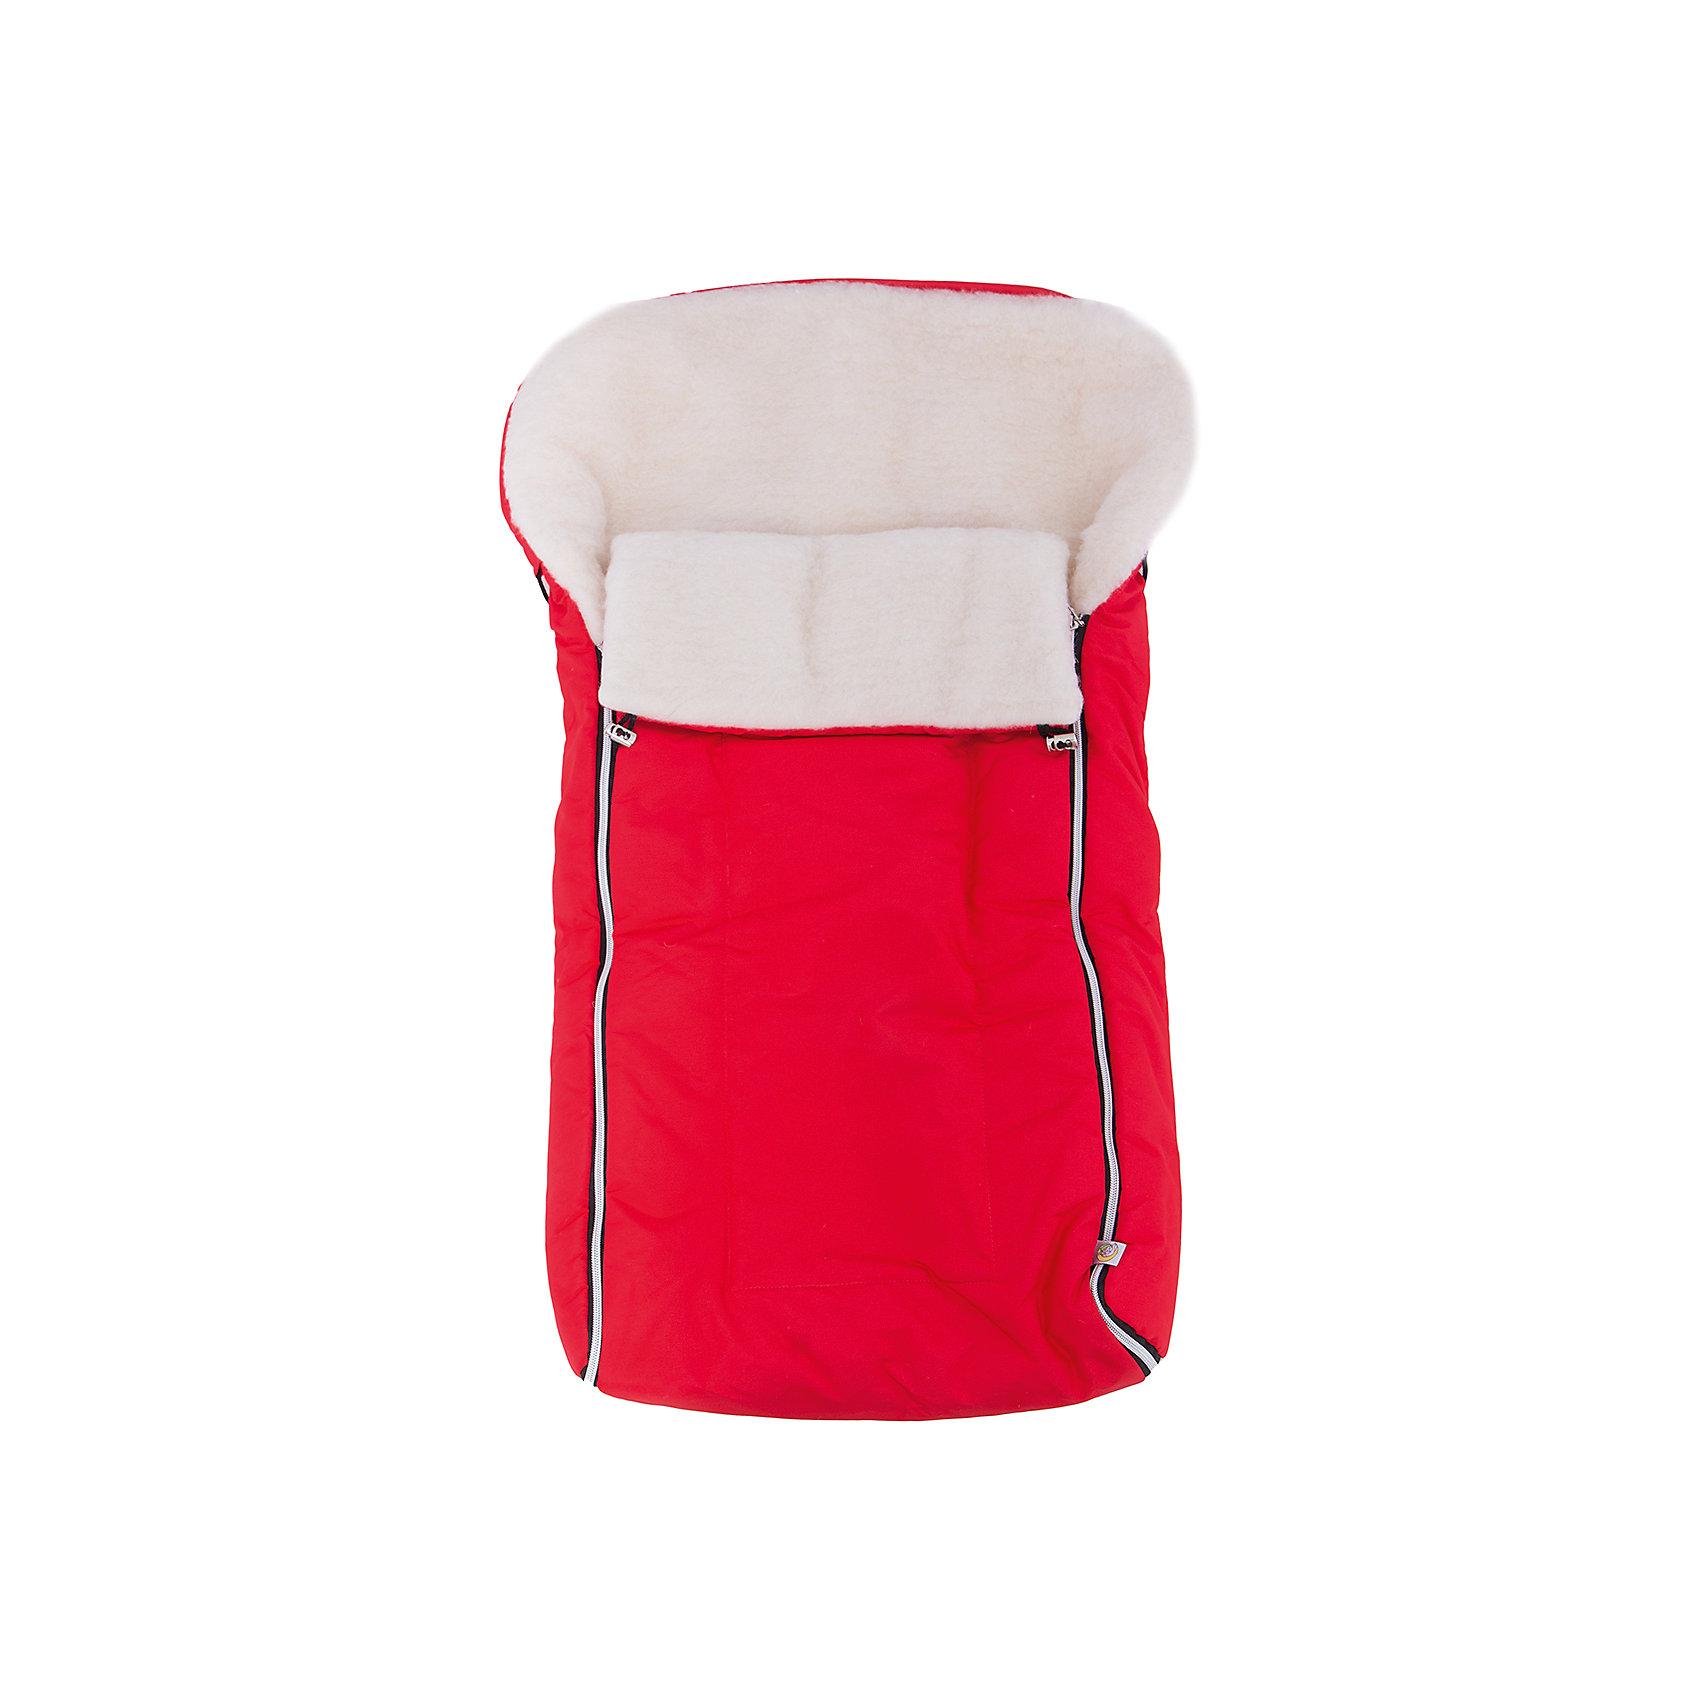 Сонный гномик Конверт в коляску Норд, Сонный гномик, красный сонный гномик конверт зимний норд серый